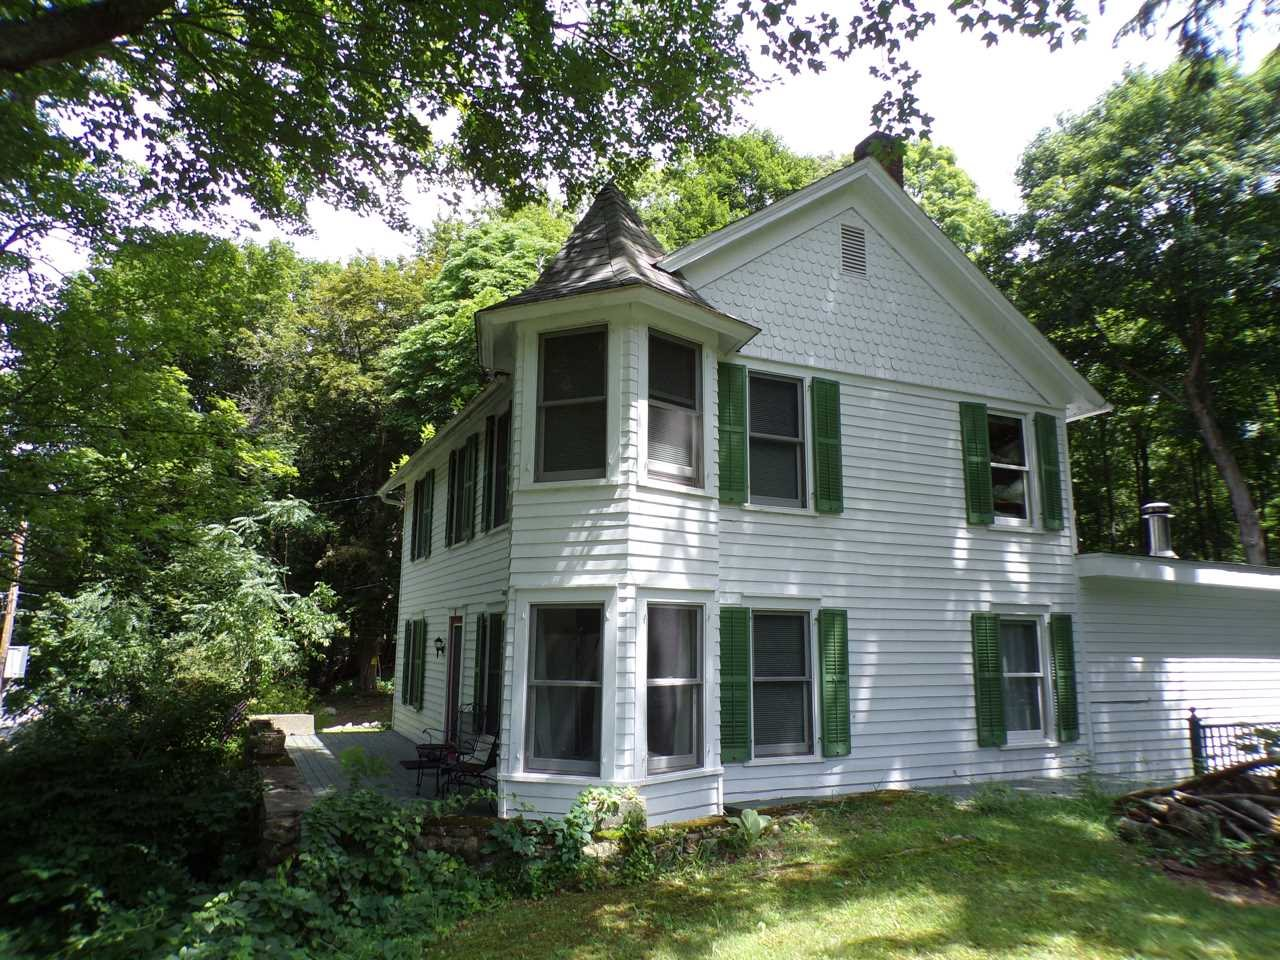 Single Family Home for Sale at 16 MILLIS LANE 16 MILLIS LANE Stanfordville, New York 12581 United States